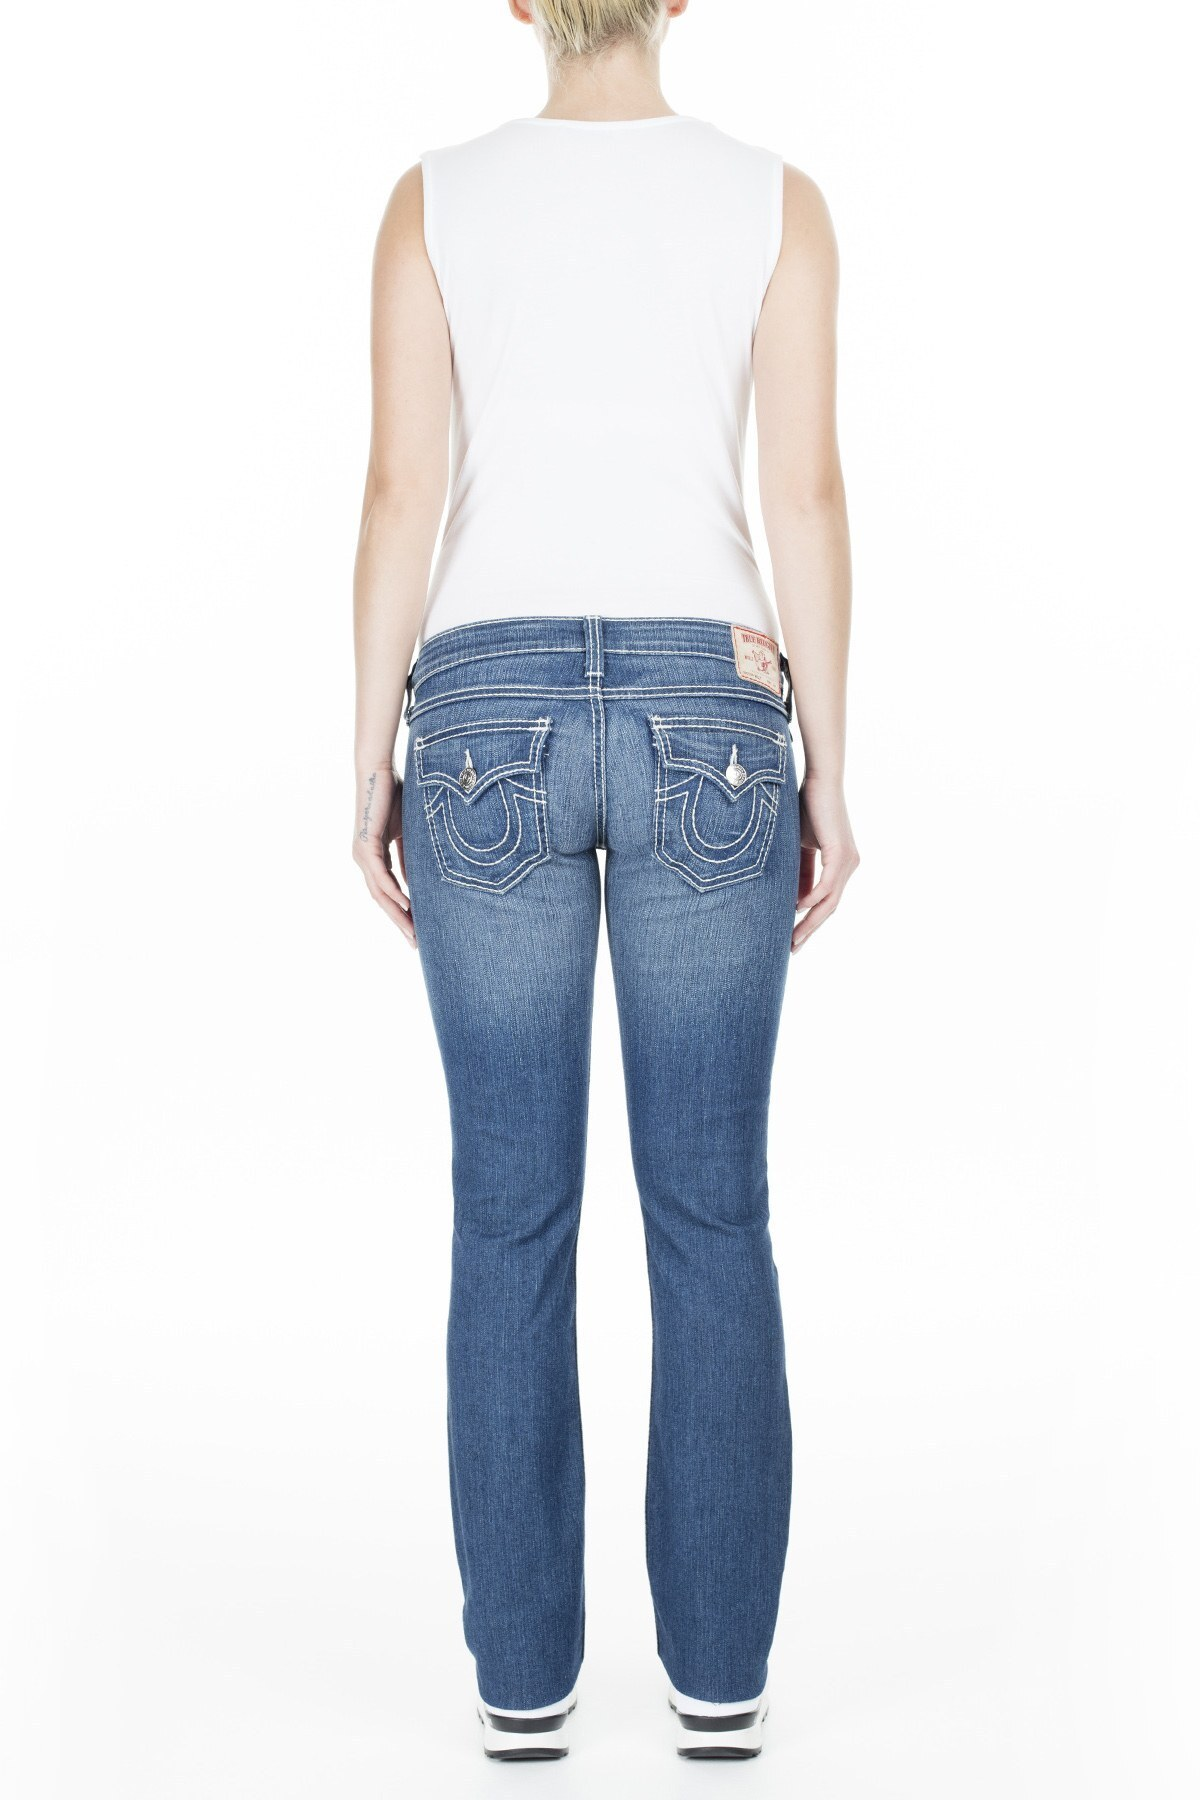 True Religion Jeans Kadın Kot Pantolon WJCV54Y40CXNM LACİVERT